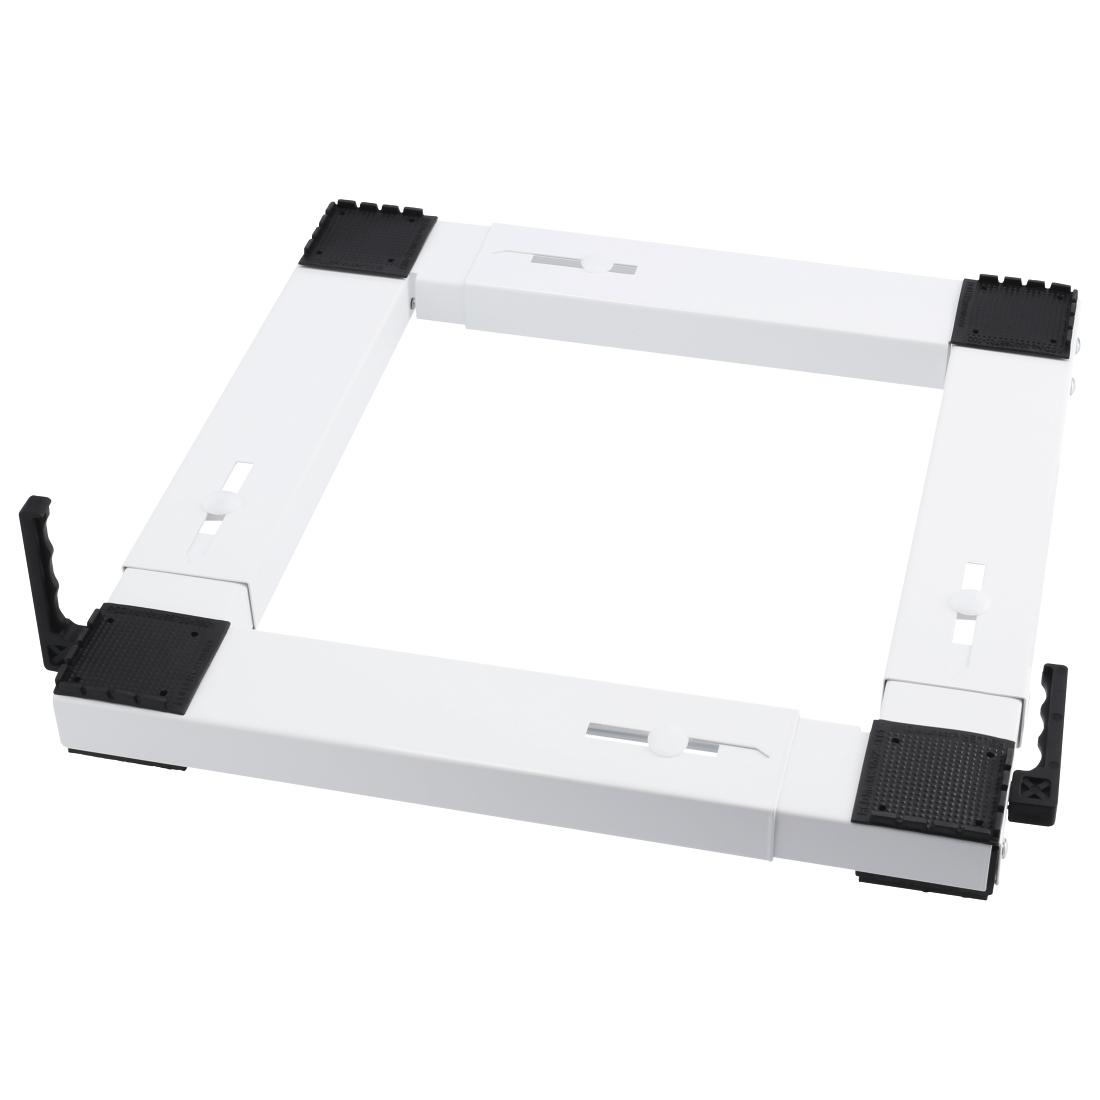 00111361 xavax transportroller f r waschmaschine und trockner. Black Bedroom Furniture Sets. Home Design Ideas